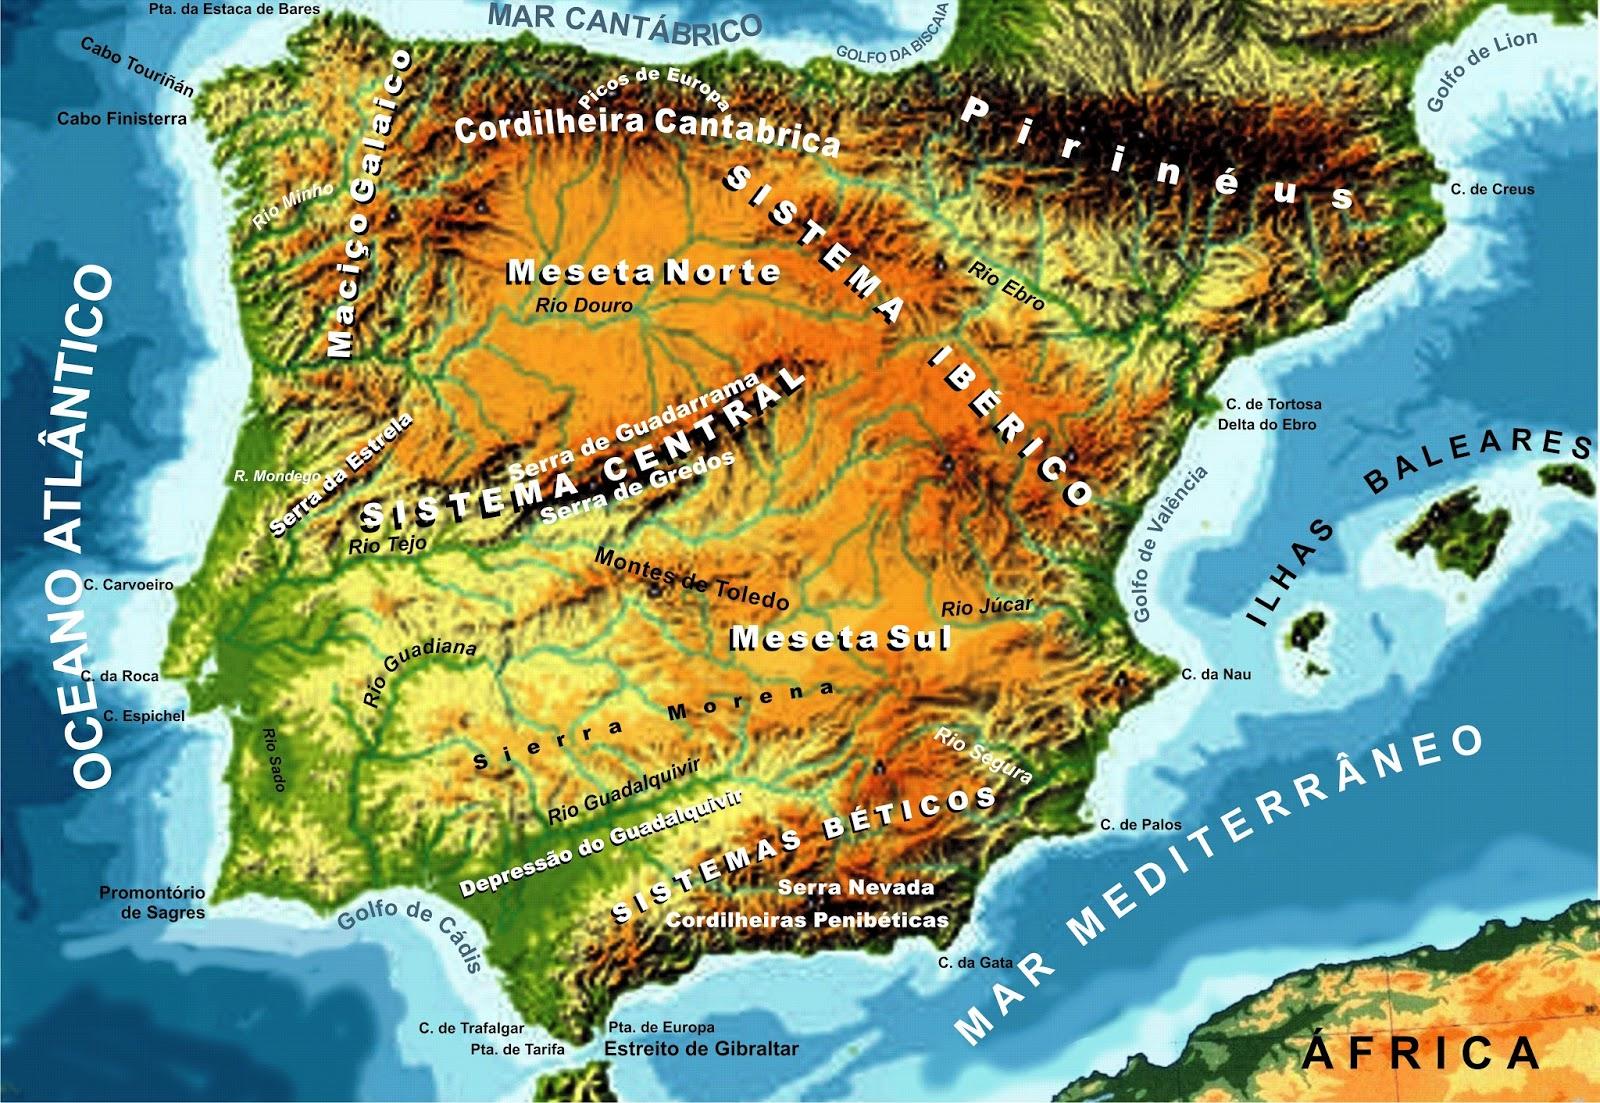 Atlas Historico Da Peninsula Iberica Caracteristicas Geograficas